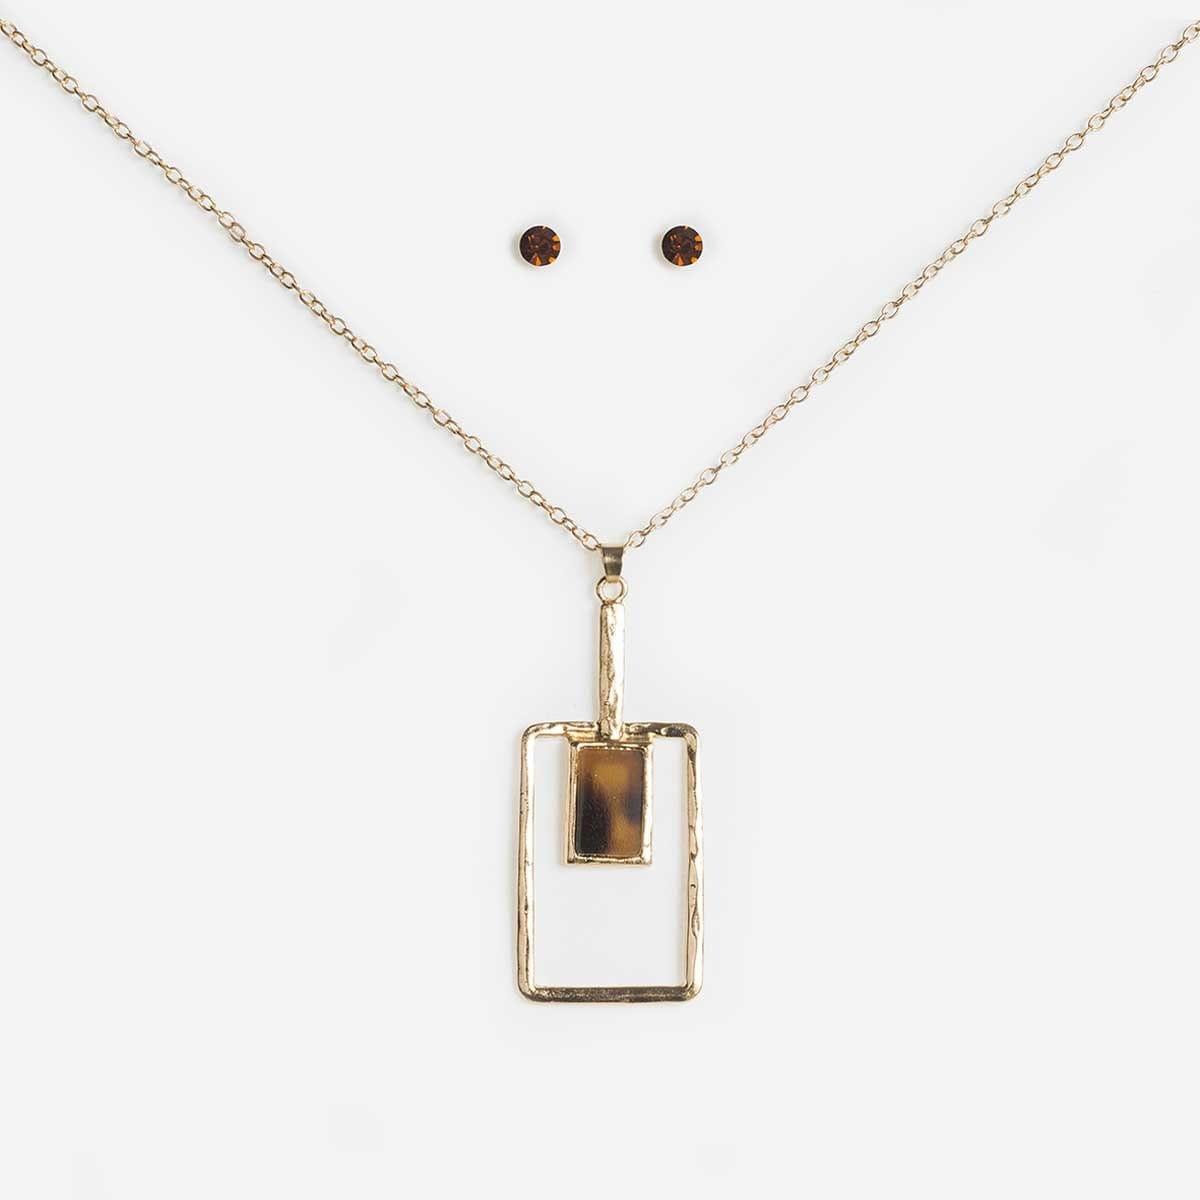 Collar Set Dorado Figuras Geométricas Wonder Charms